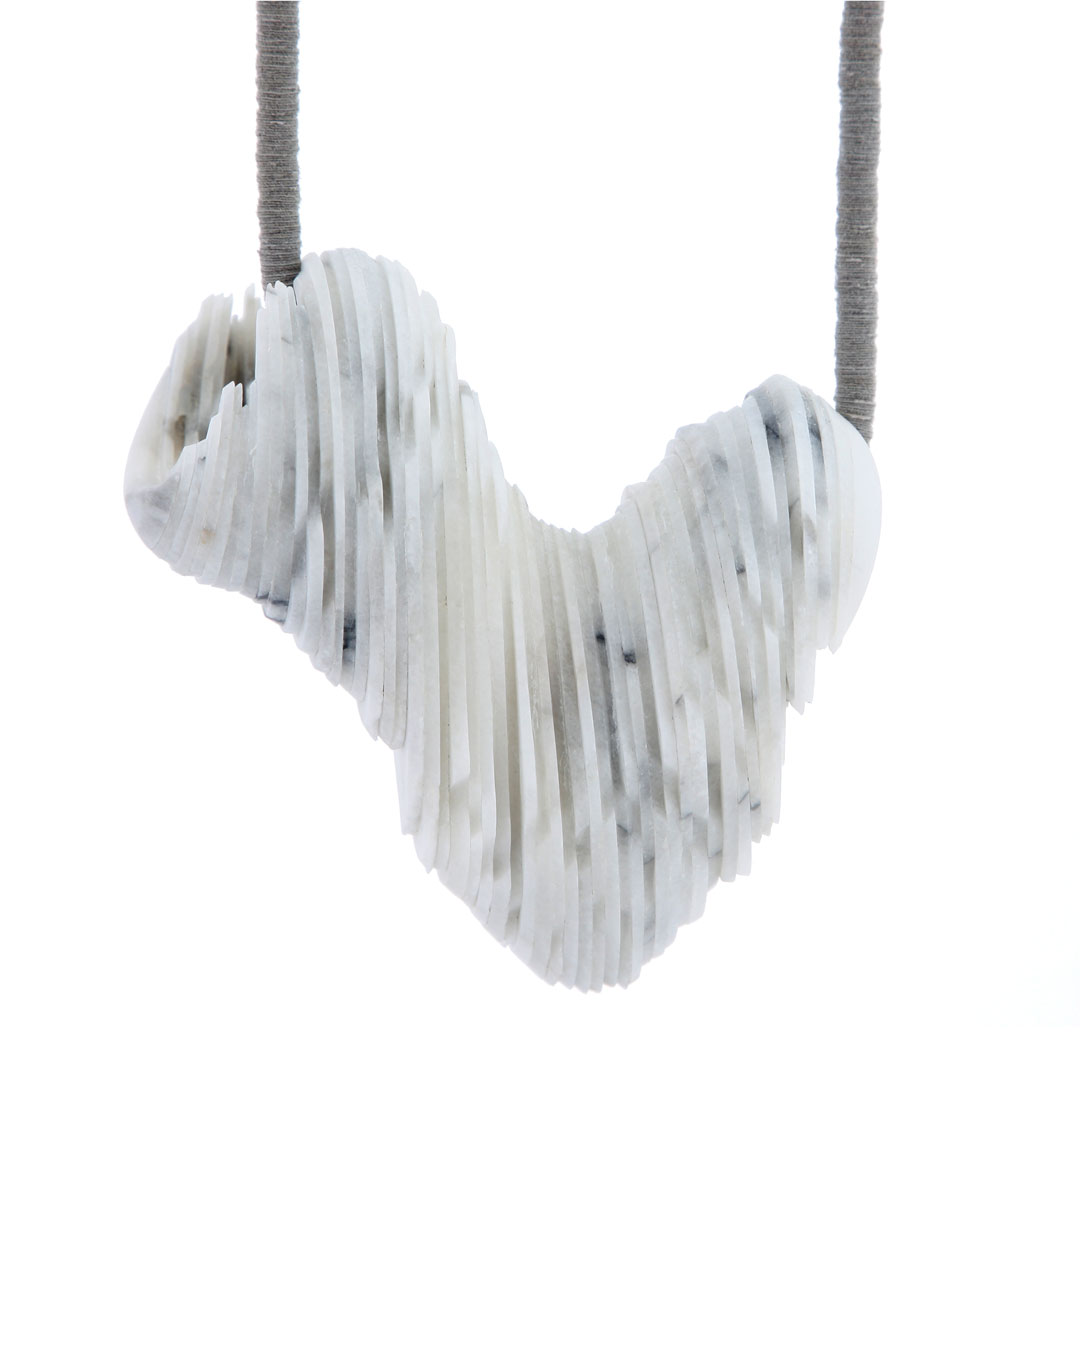 Tarja Tuupanen, untitled, 2015, necklace; ready-made marble tableware, velour sticker, steel wire, brass, 450 x 120 x 50 mm, €1700